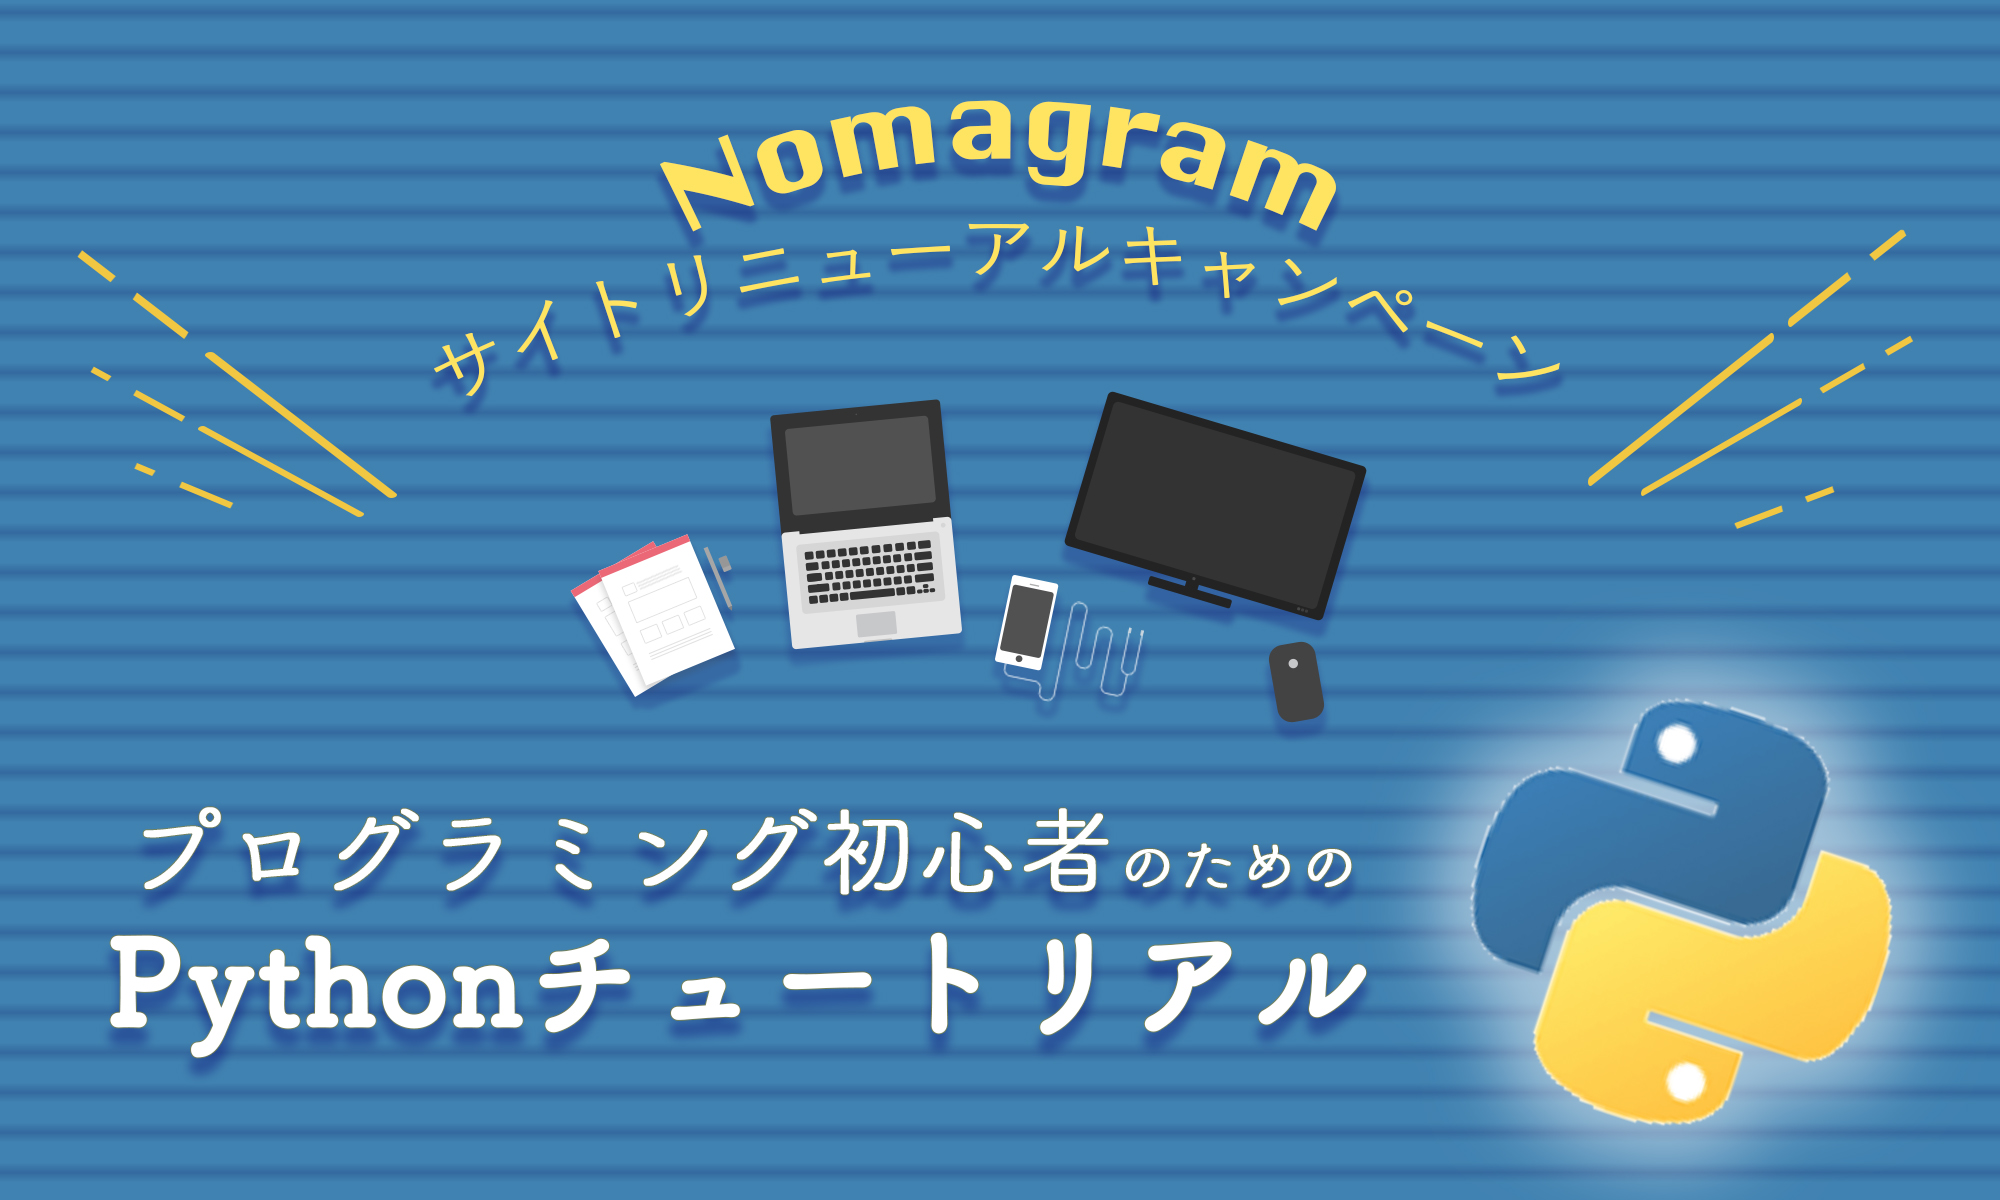 nomagram - JavaScriptの歴史 - Node.jsとReact登場